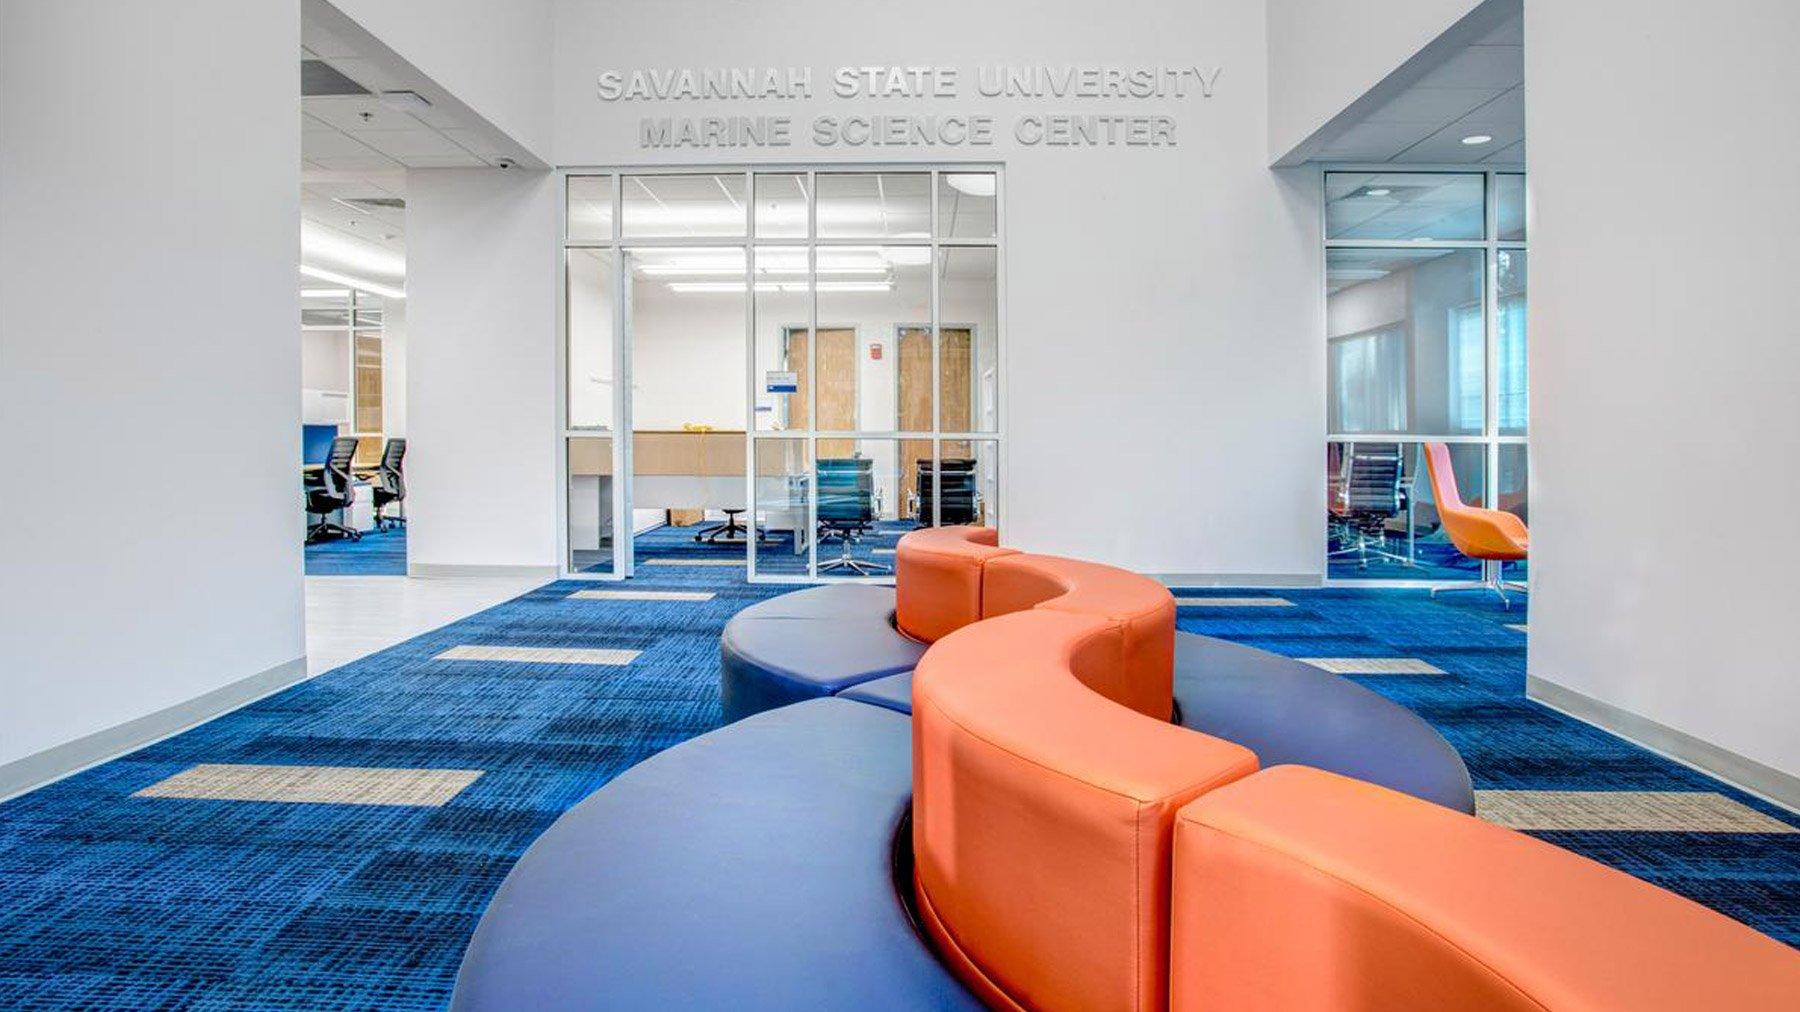 Savannah State University Marine Science Center